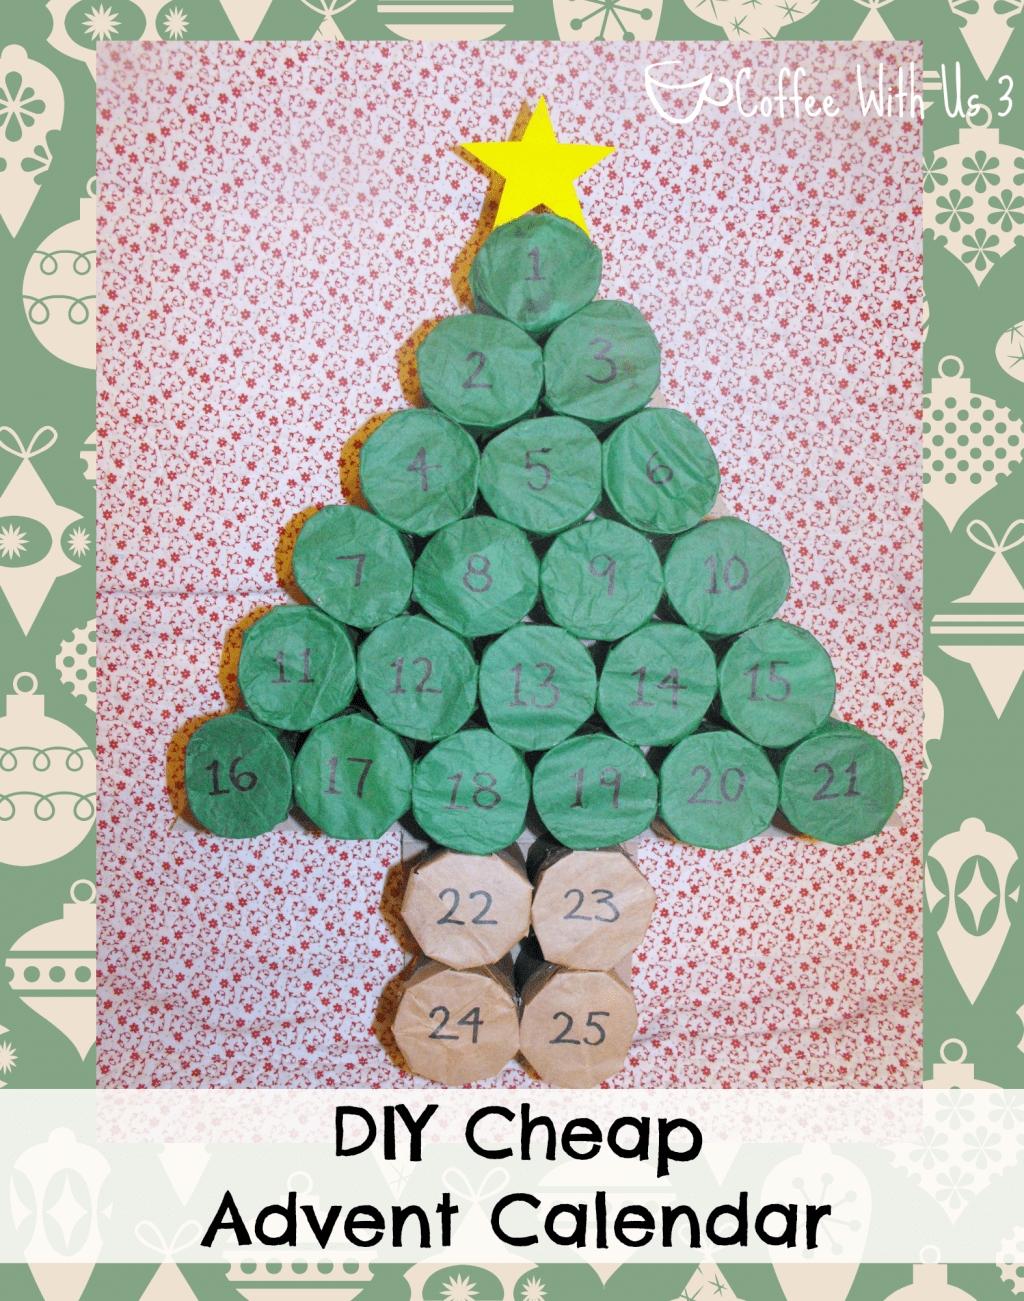 Diy Cheap Advent Calendar | Coffee With Us 3